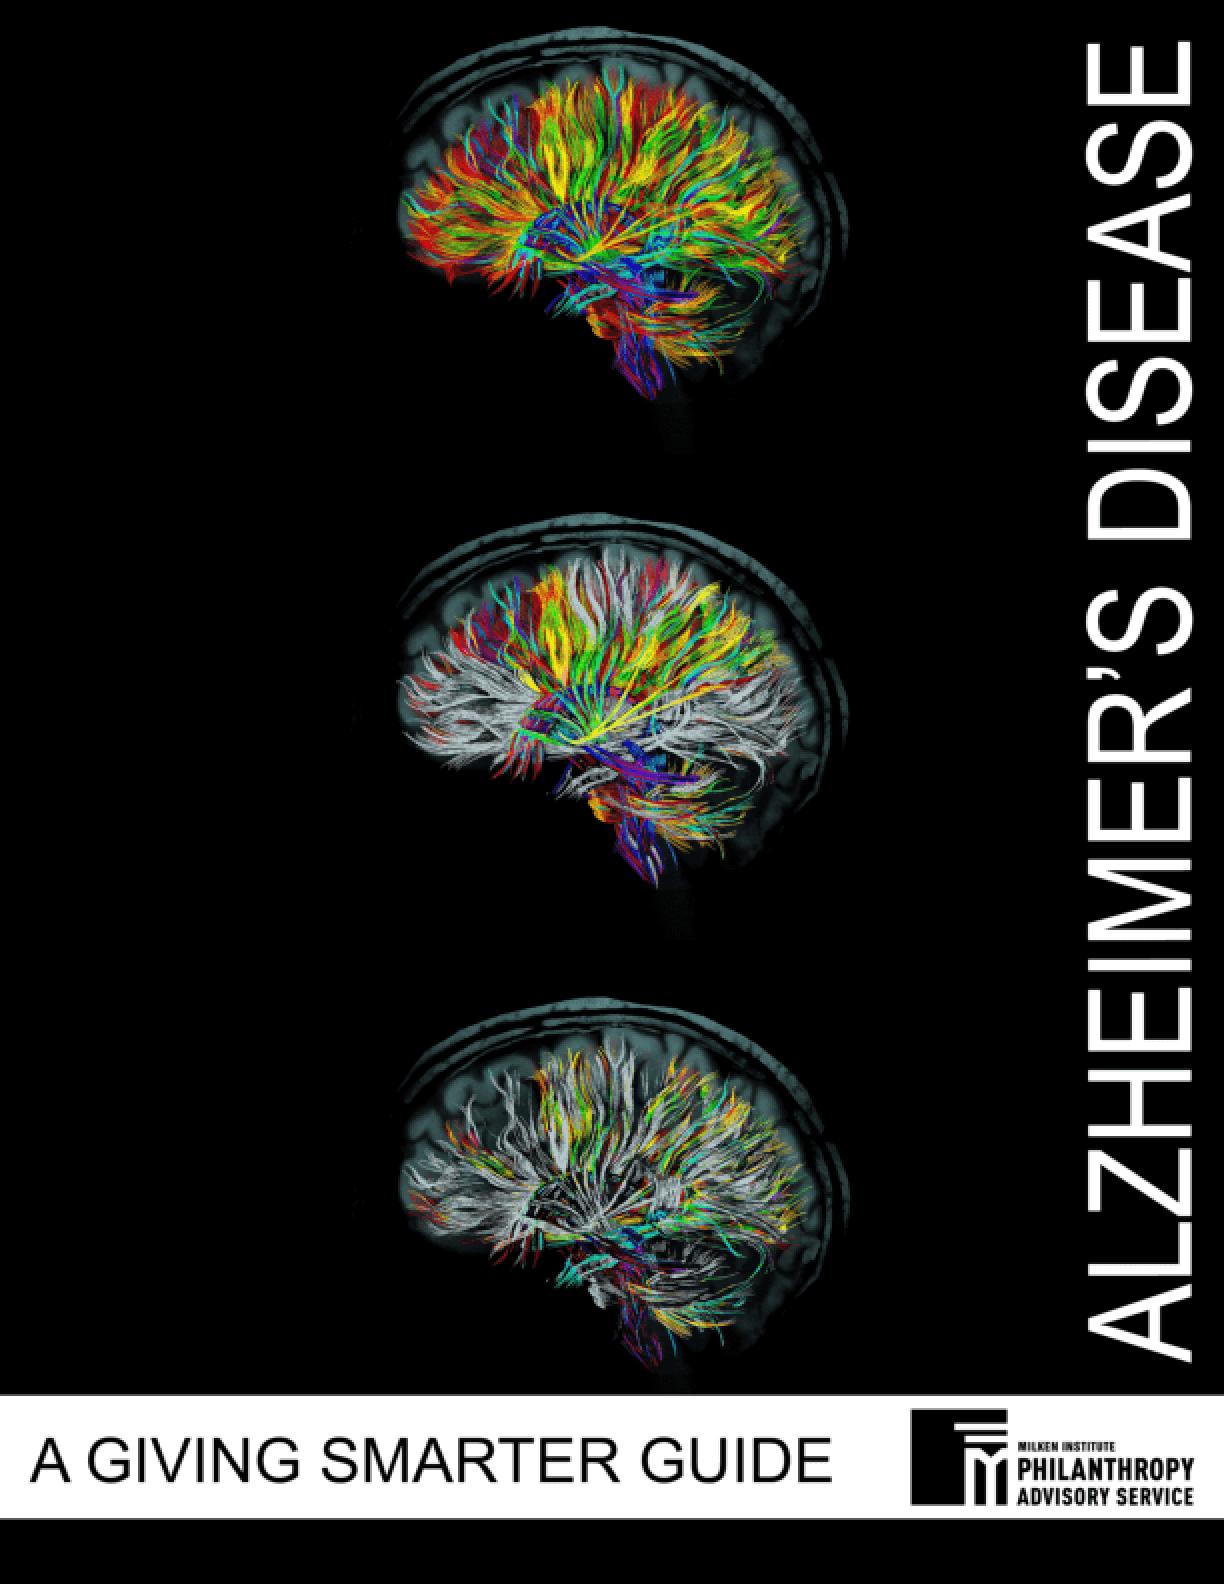 Alzheimer's Disease: A Giving Smarter Guide